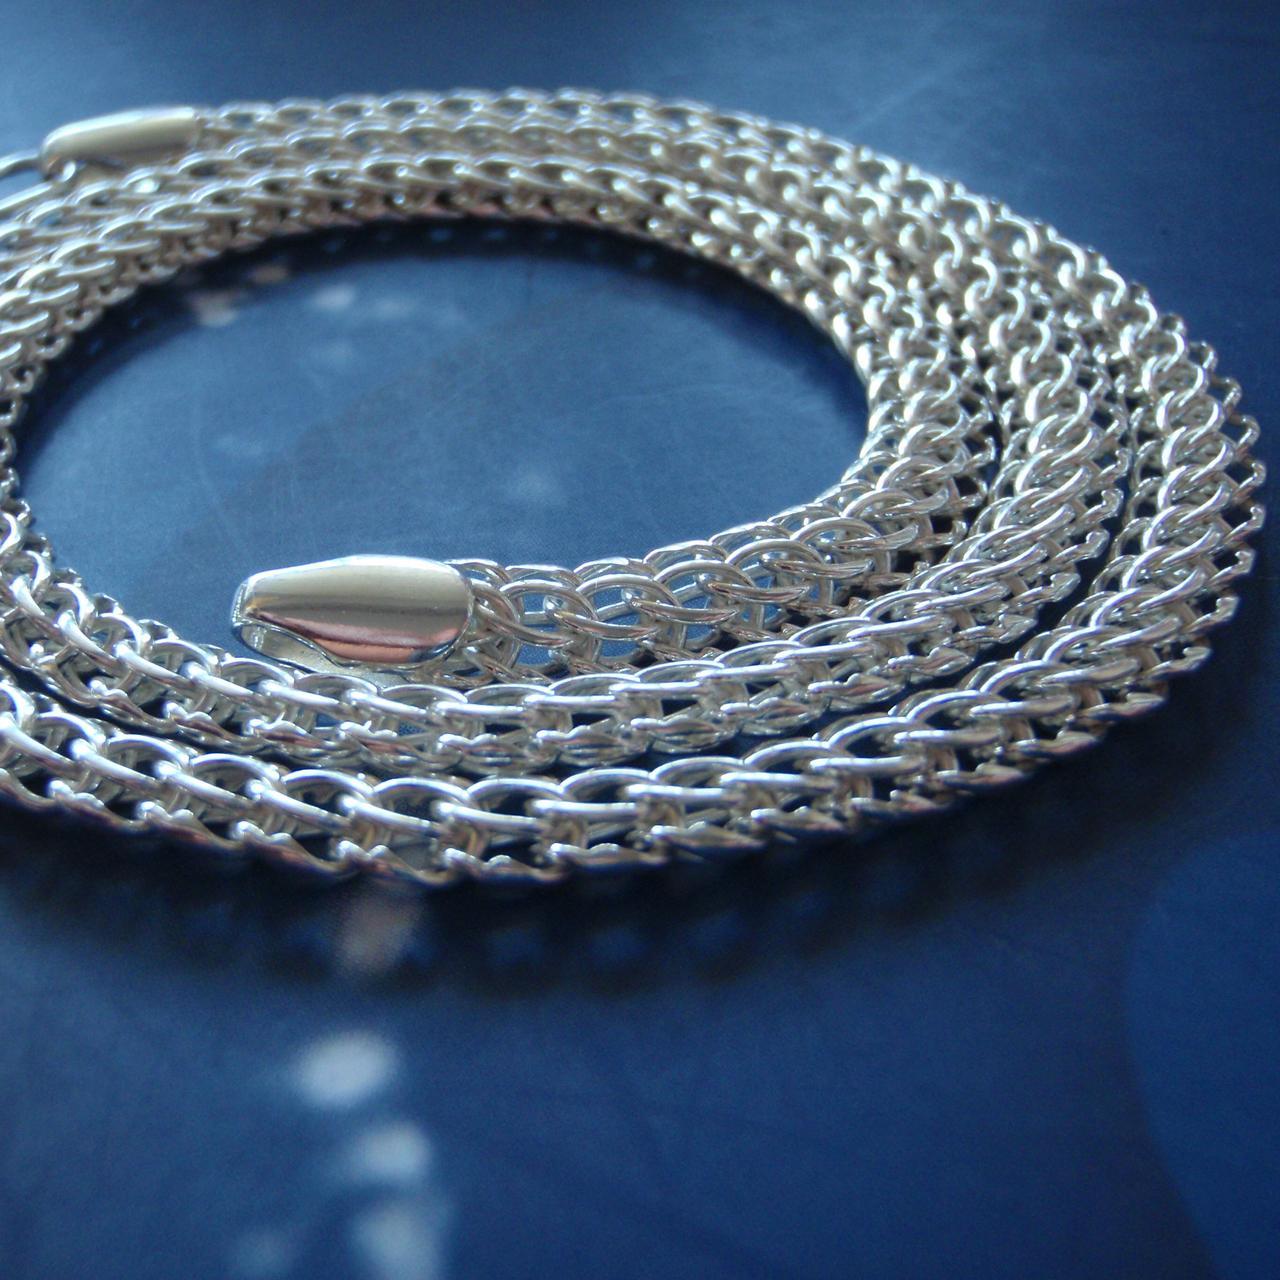 Серебряная цепочка, 550мм, 26 грамм, Питон, светлое серебро